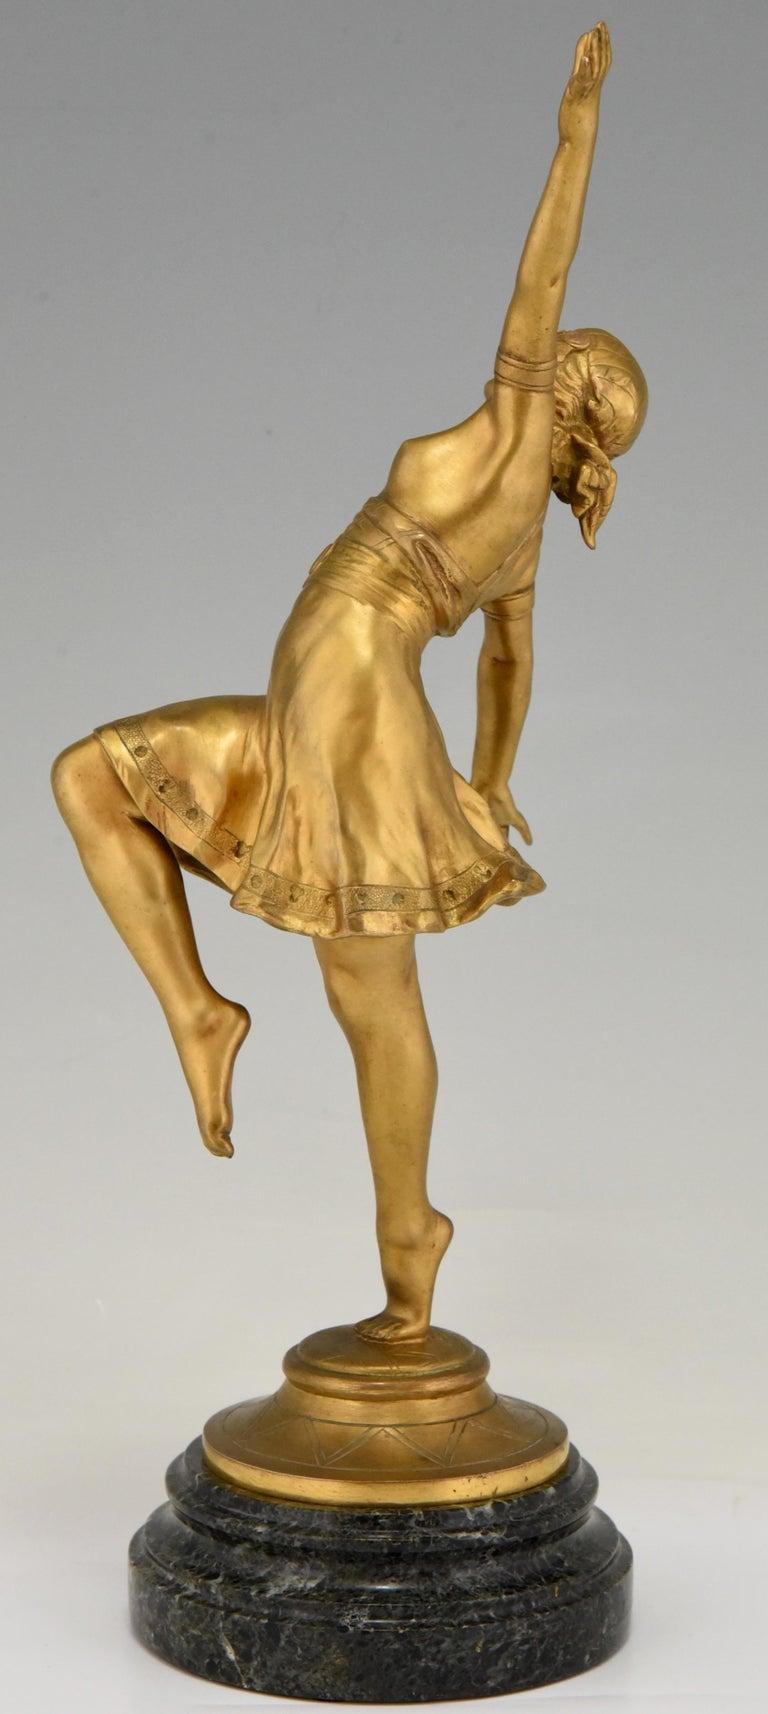 Early 20th Century Art Nouveau Bronze Sculpture Oriental Dancer Jean Garnier, France, 1900 For Sale